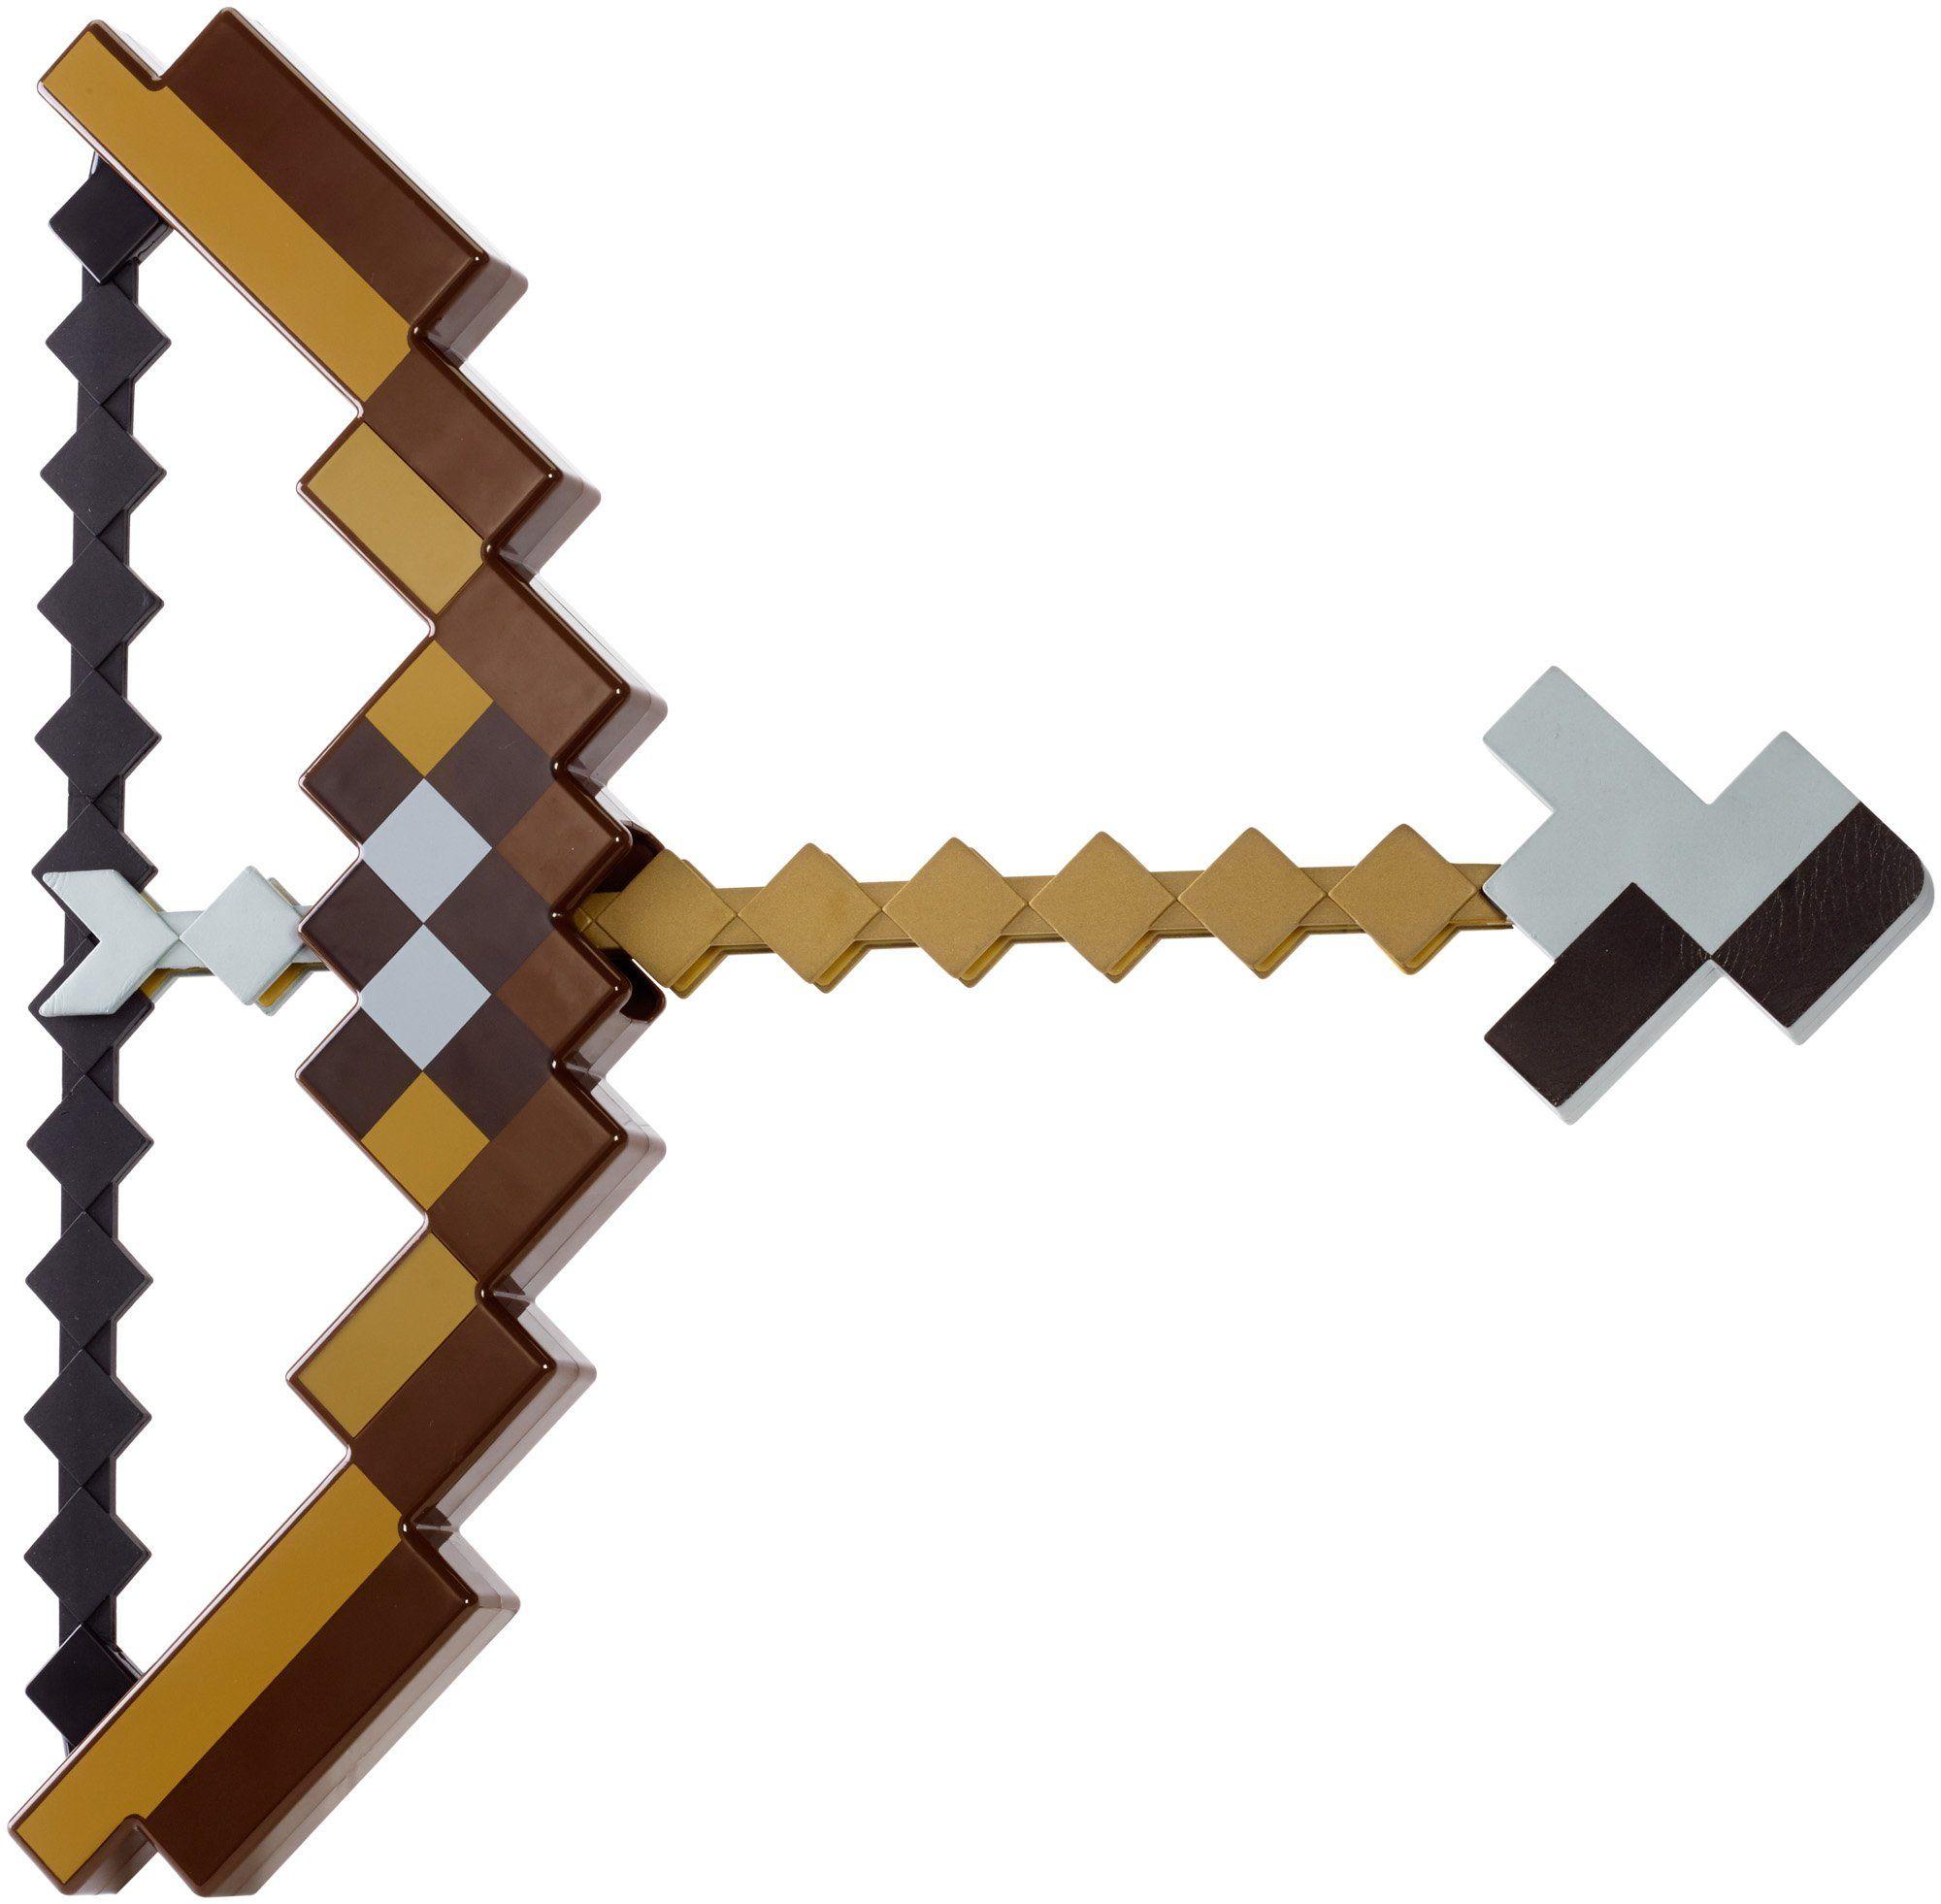 Amazon com: Minecraft Bow And Arrow: Toys & Games